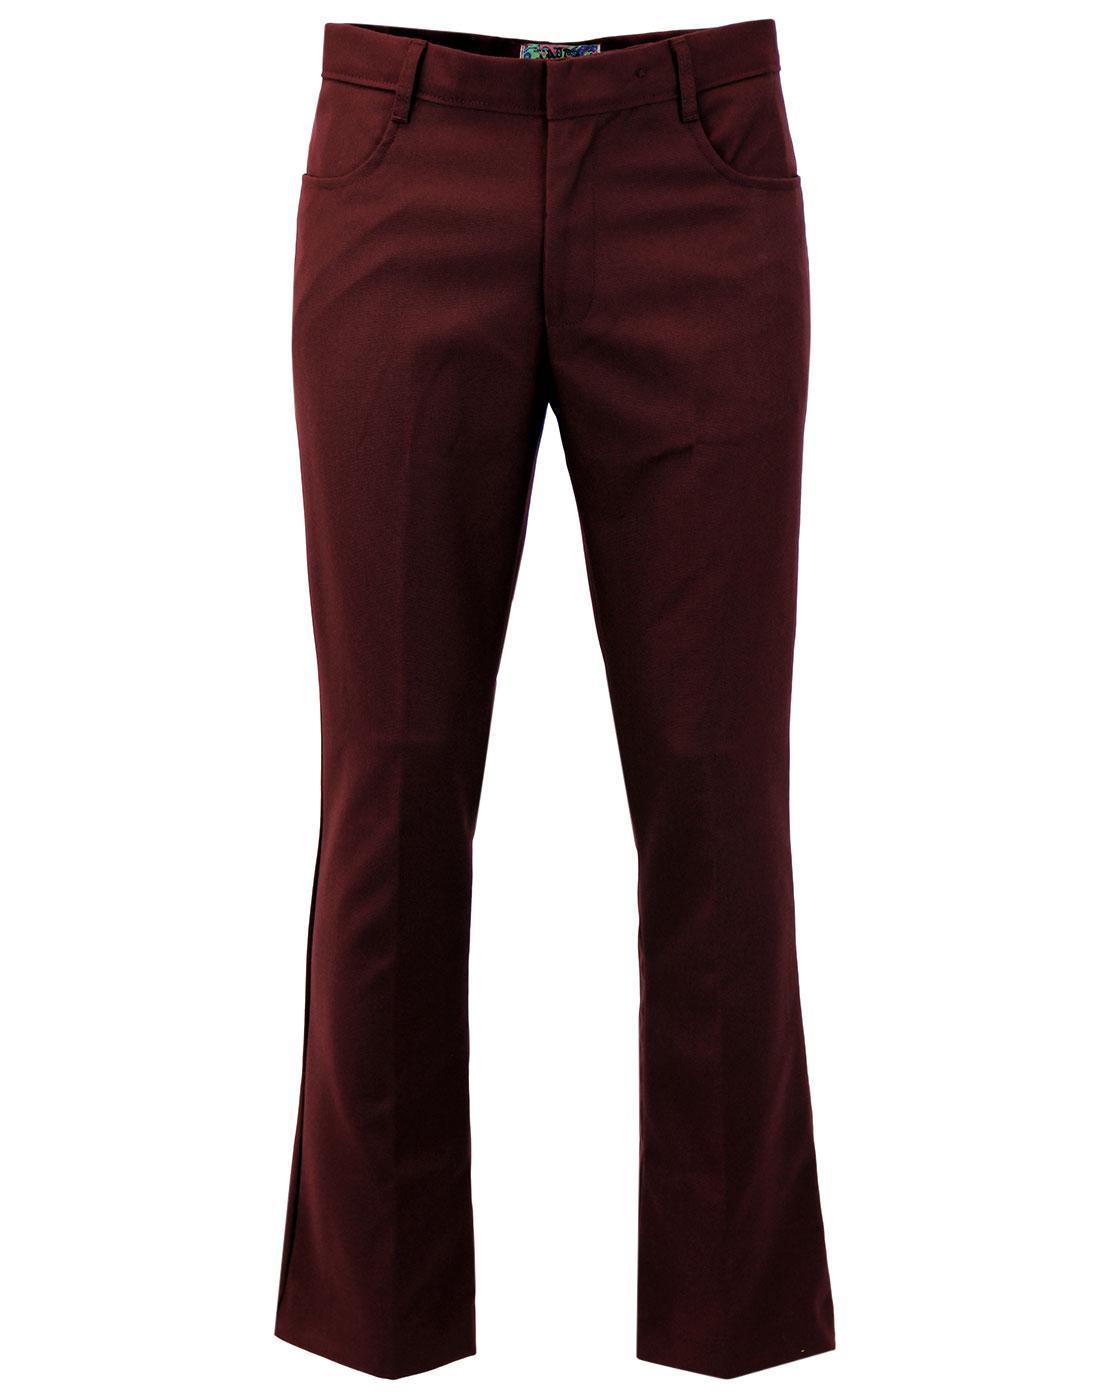 Logan Bootcut MADCAP ENGLAND Hopsack Trousers (Bu)